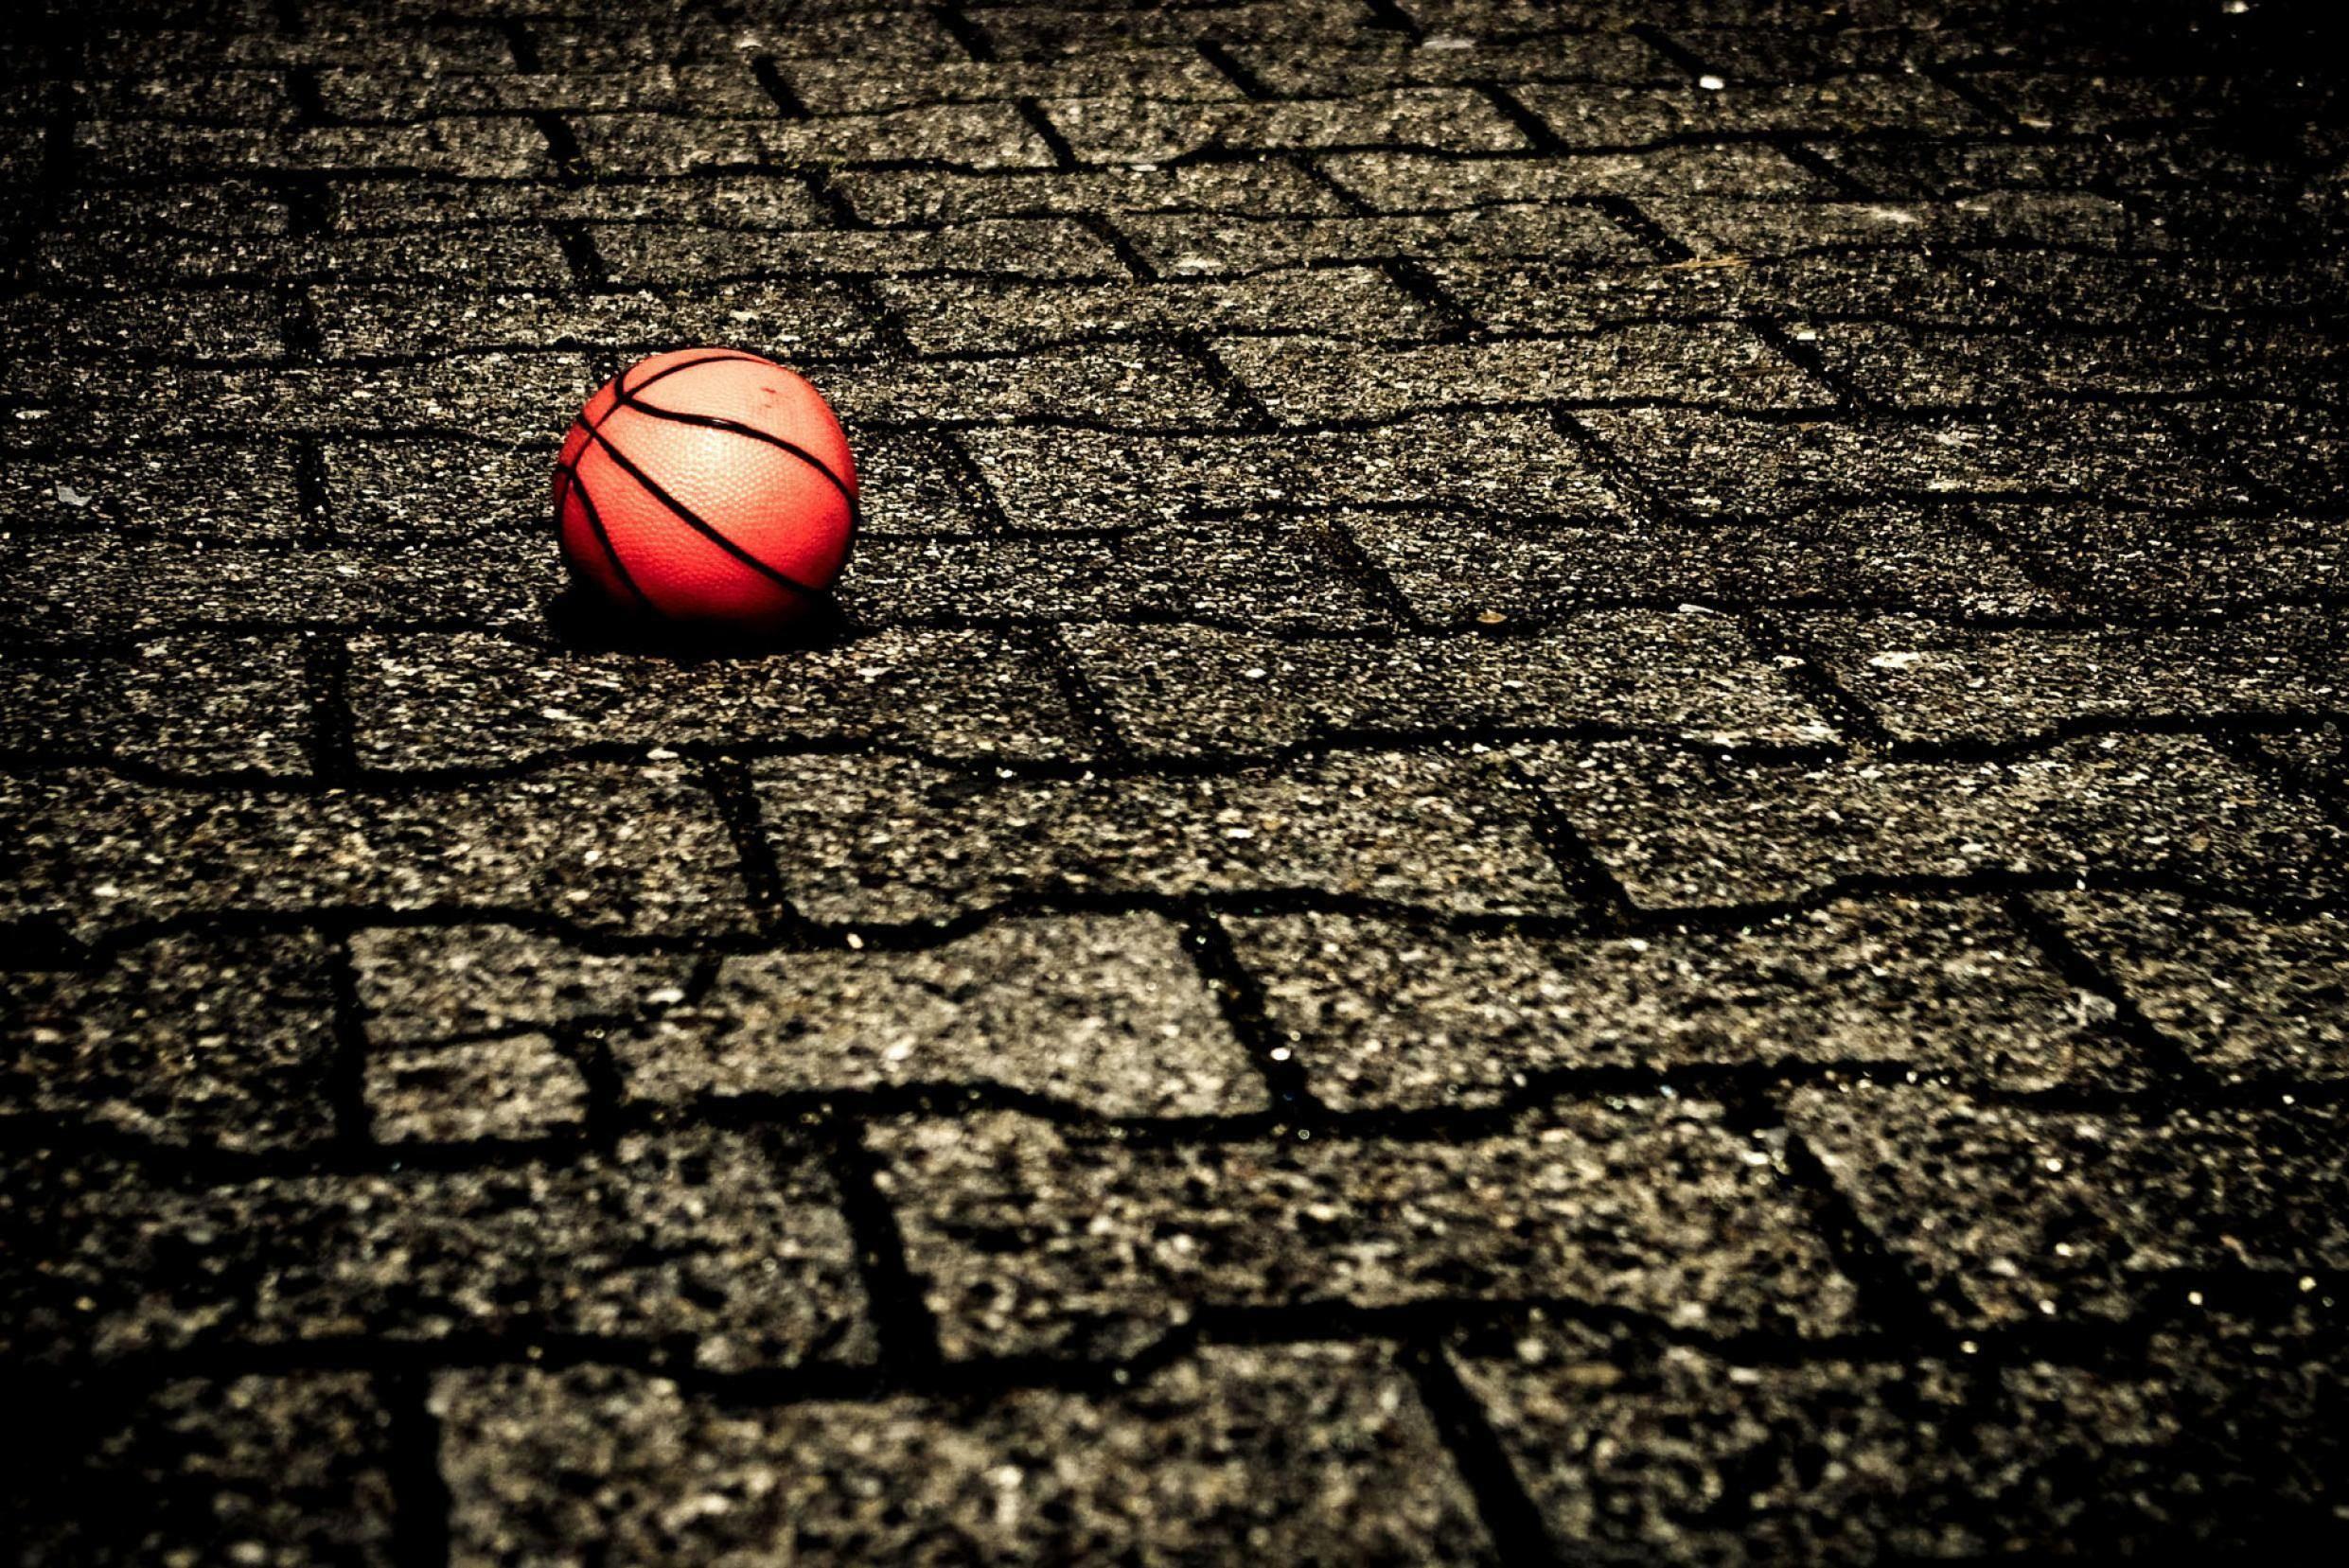 Basketball Nike Wallpaper